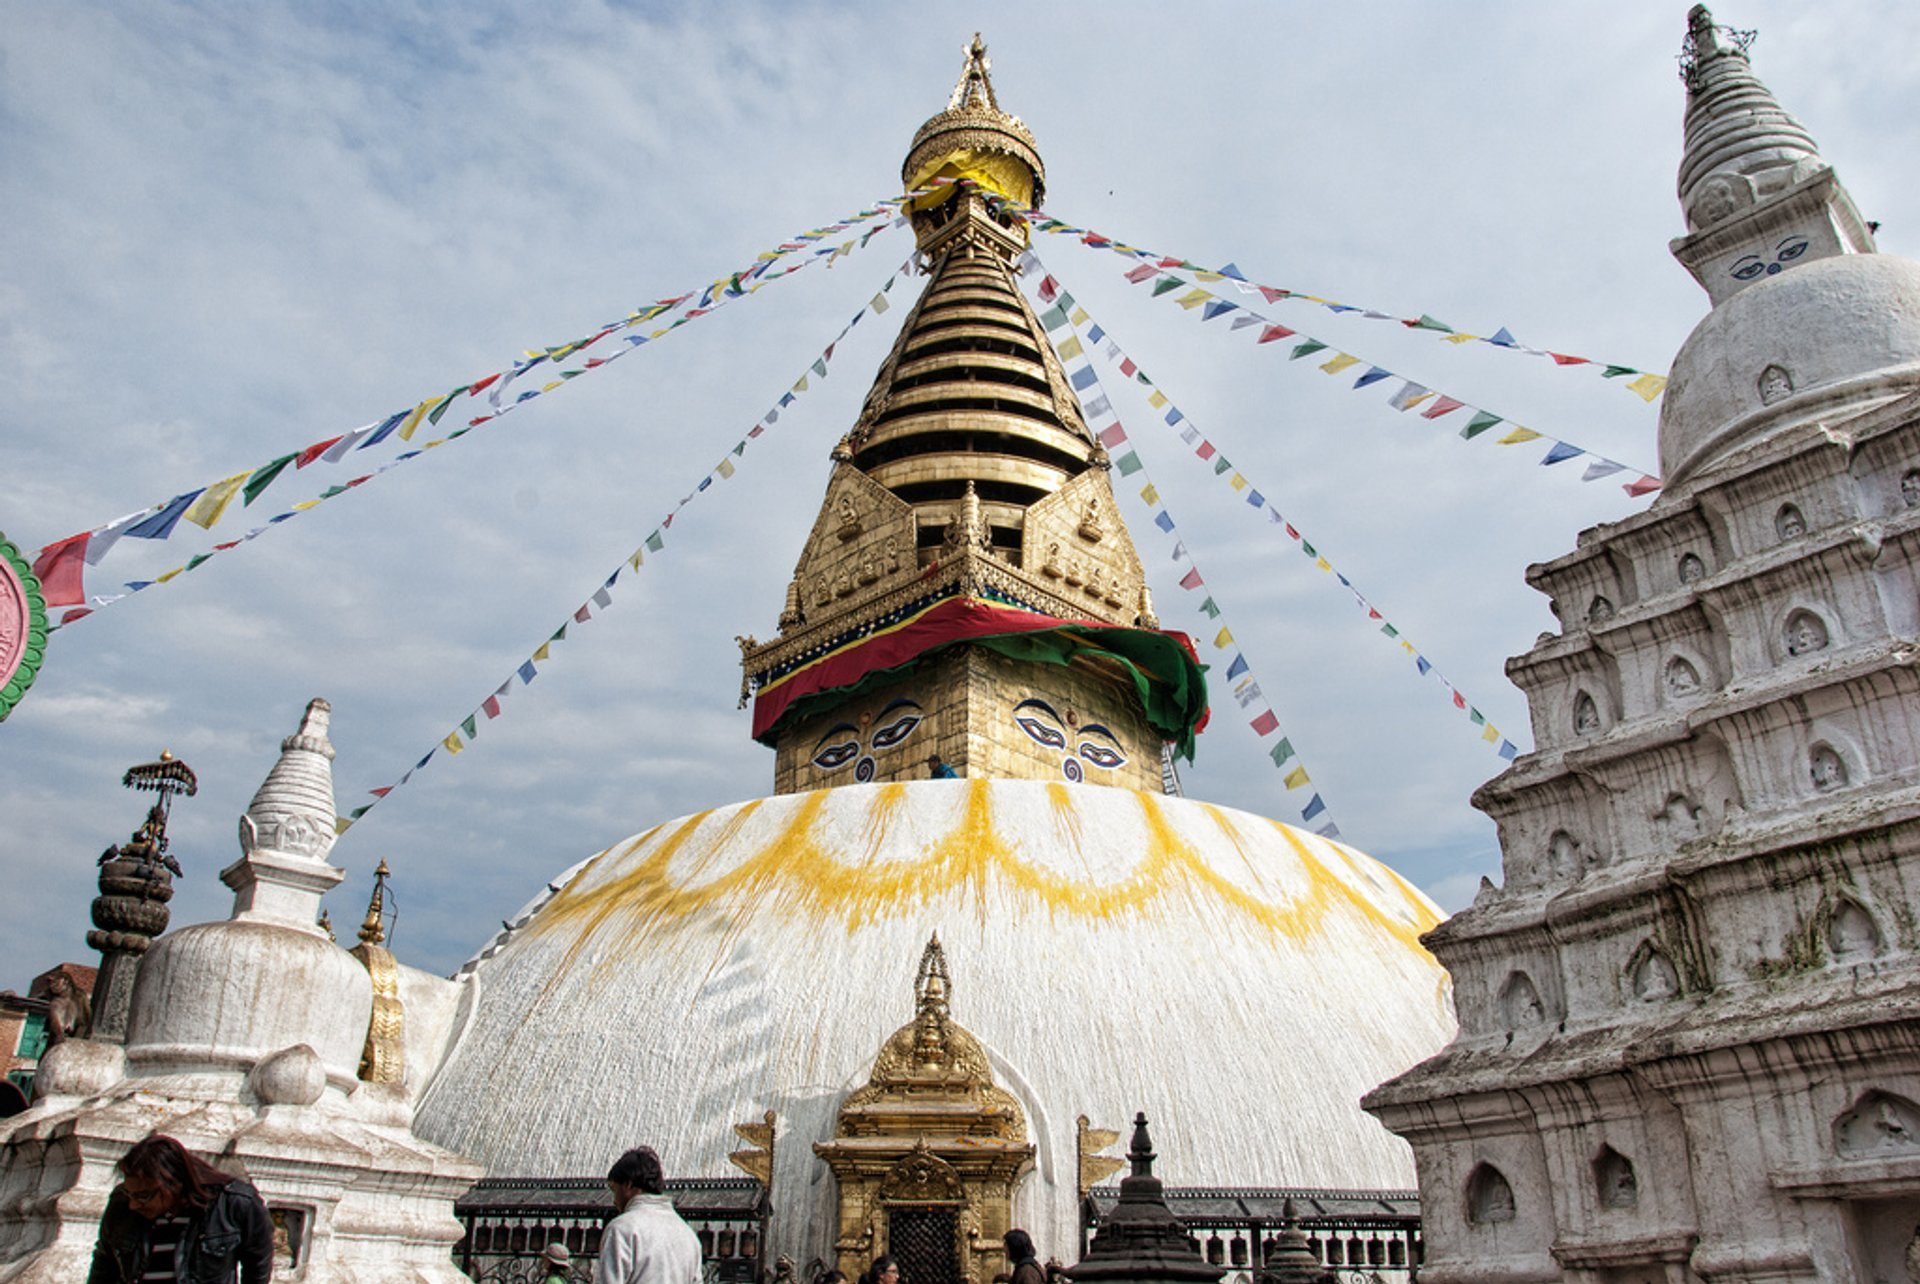 Swayambhunath (Monkey Temple) in Kathmandu 2020 - Best Time